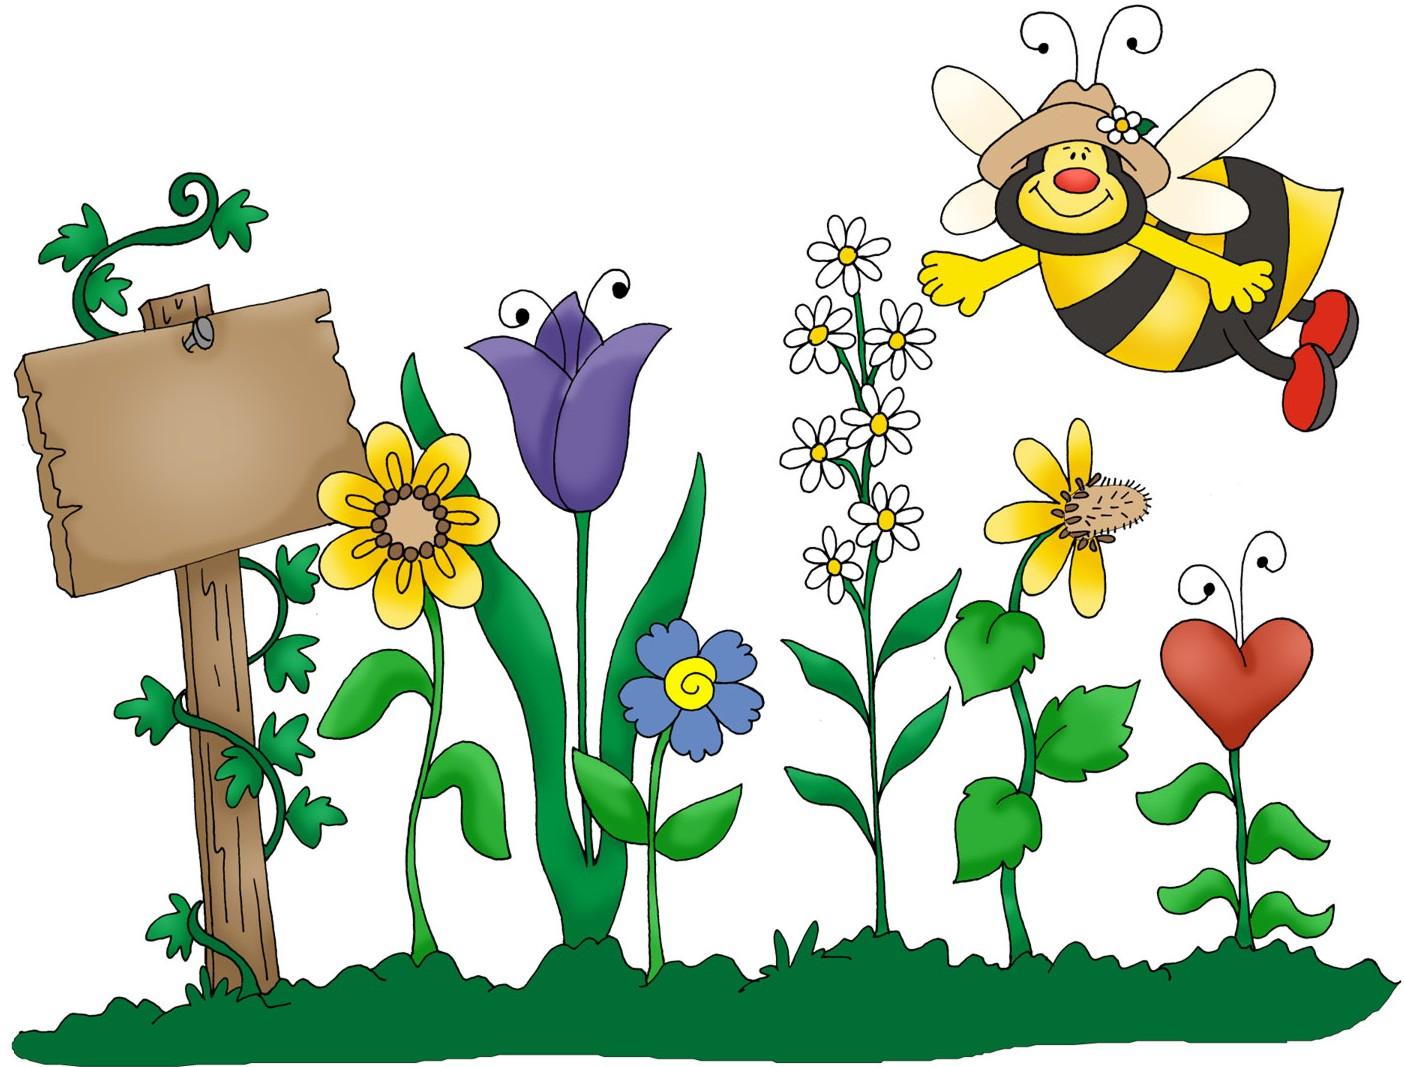 Gardener clipart preschool. Spring garden free image